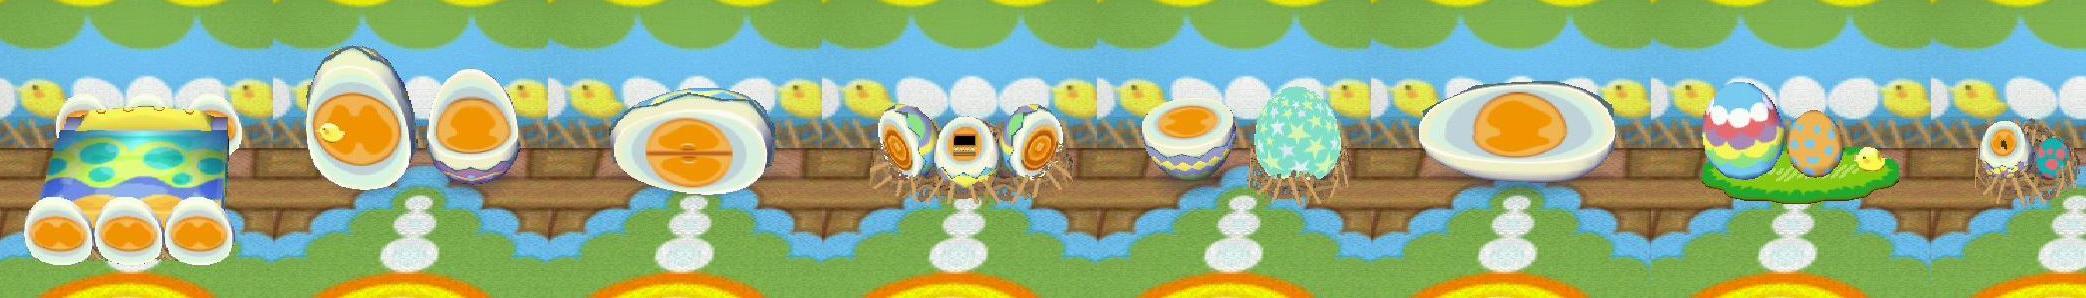 Egg Series   Animal Crossing Wiki   Fandom powered by Wikia